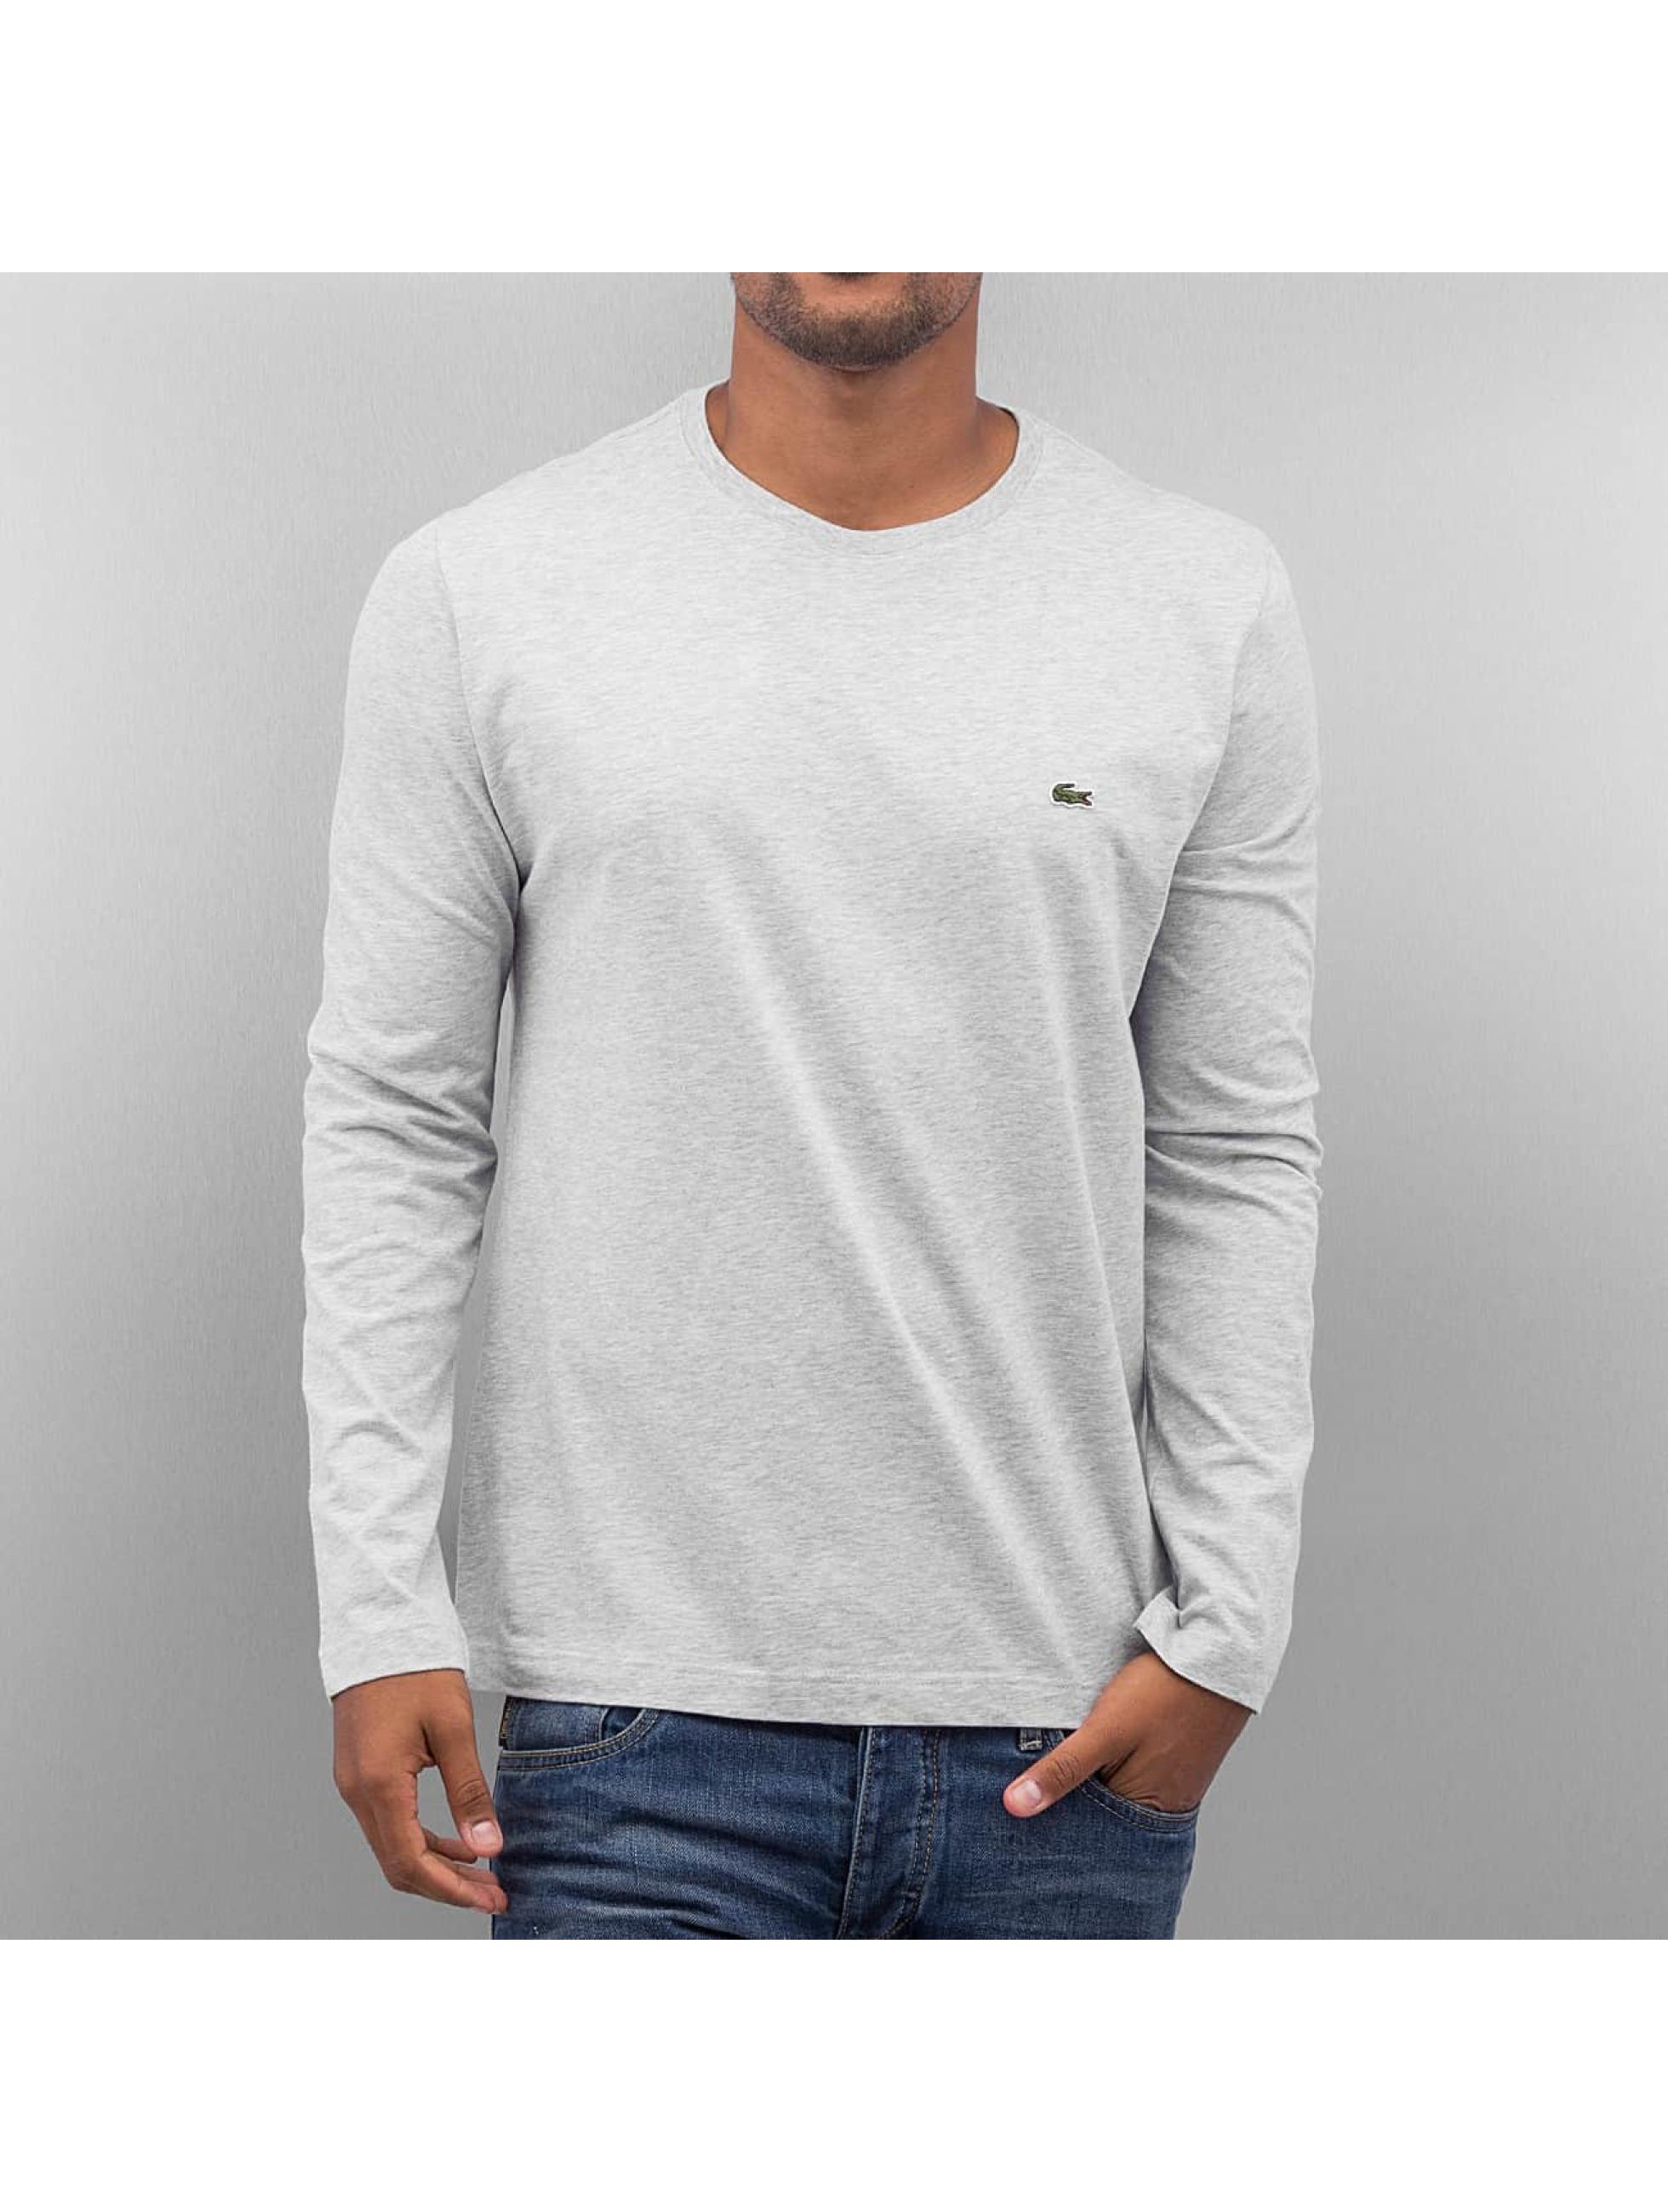 Lacoste Classic T-Shirt manches longues Classic gris